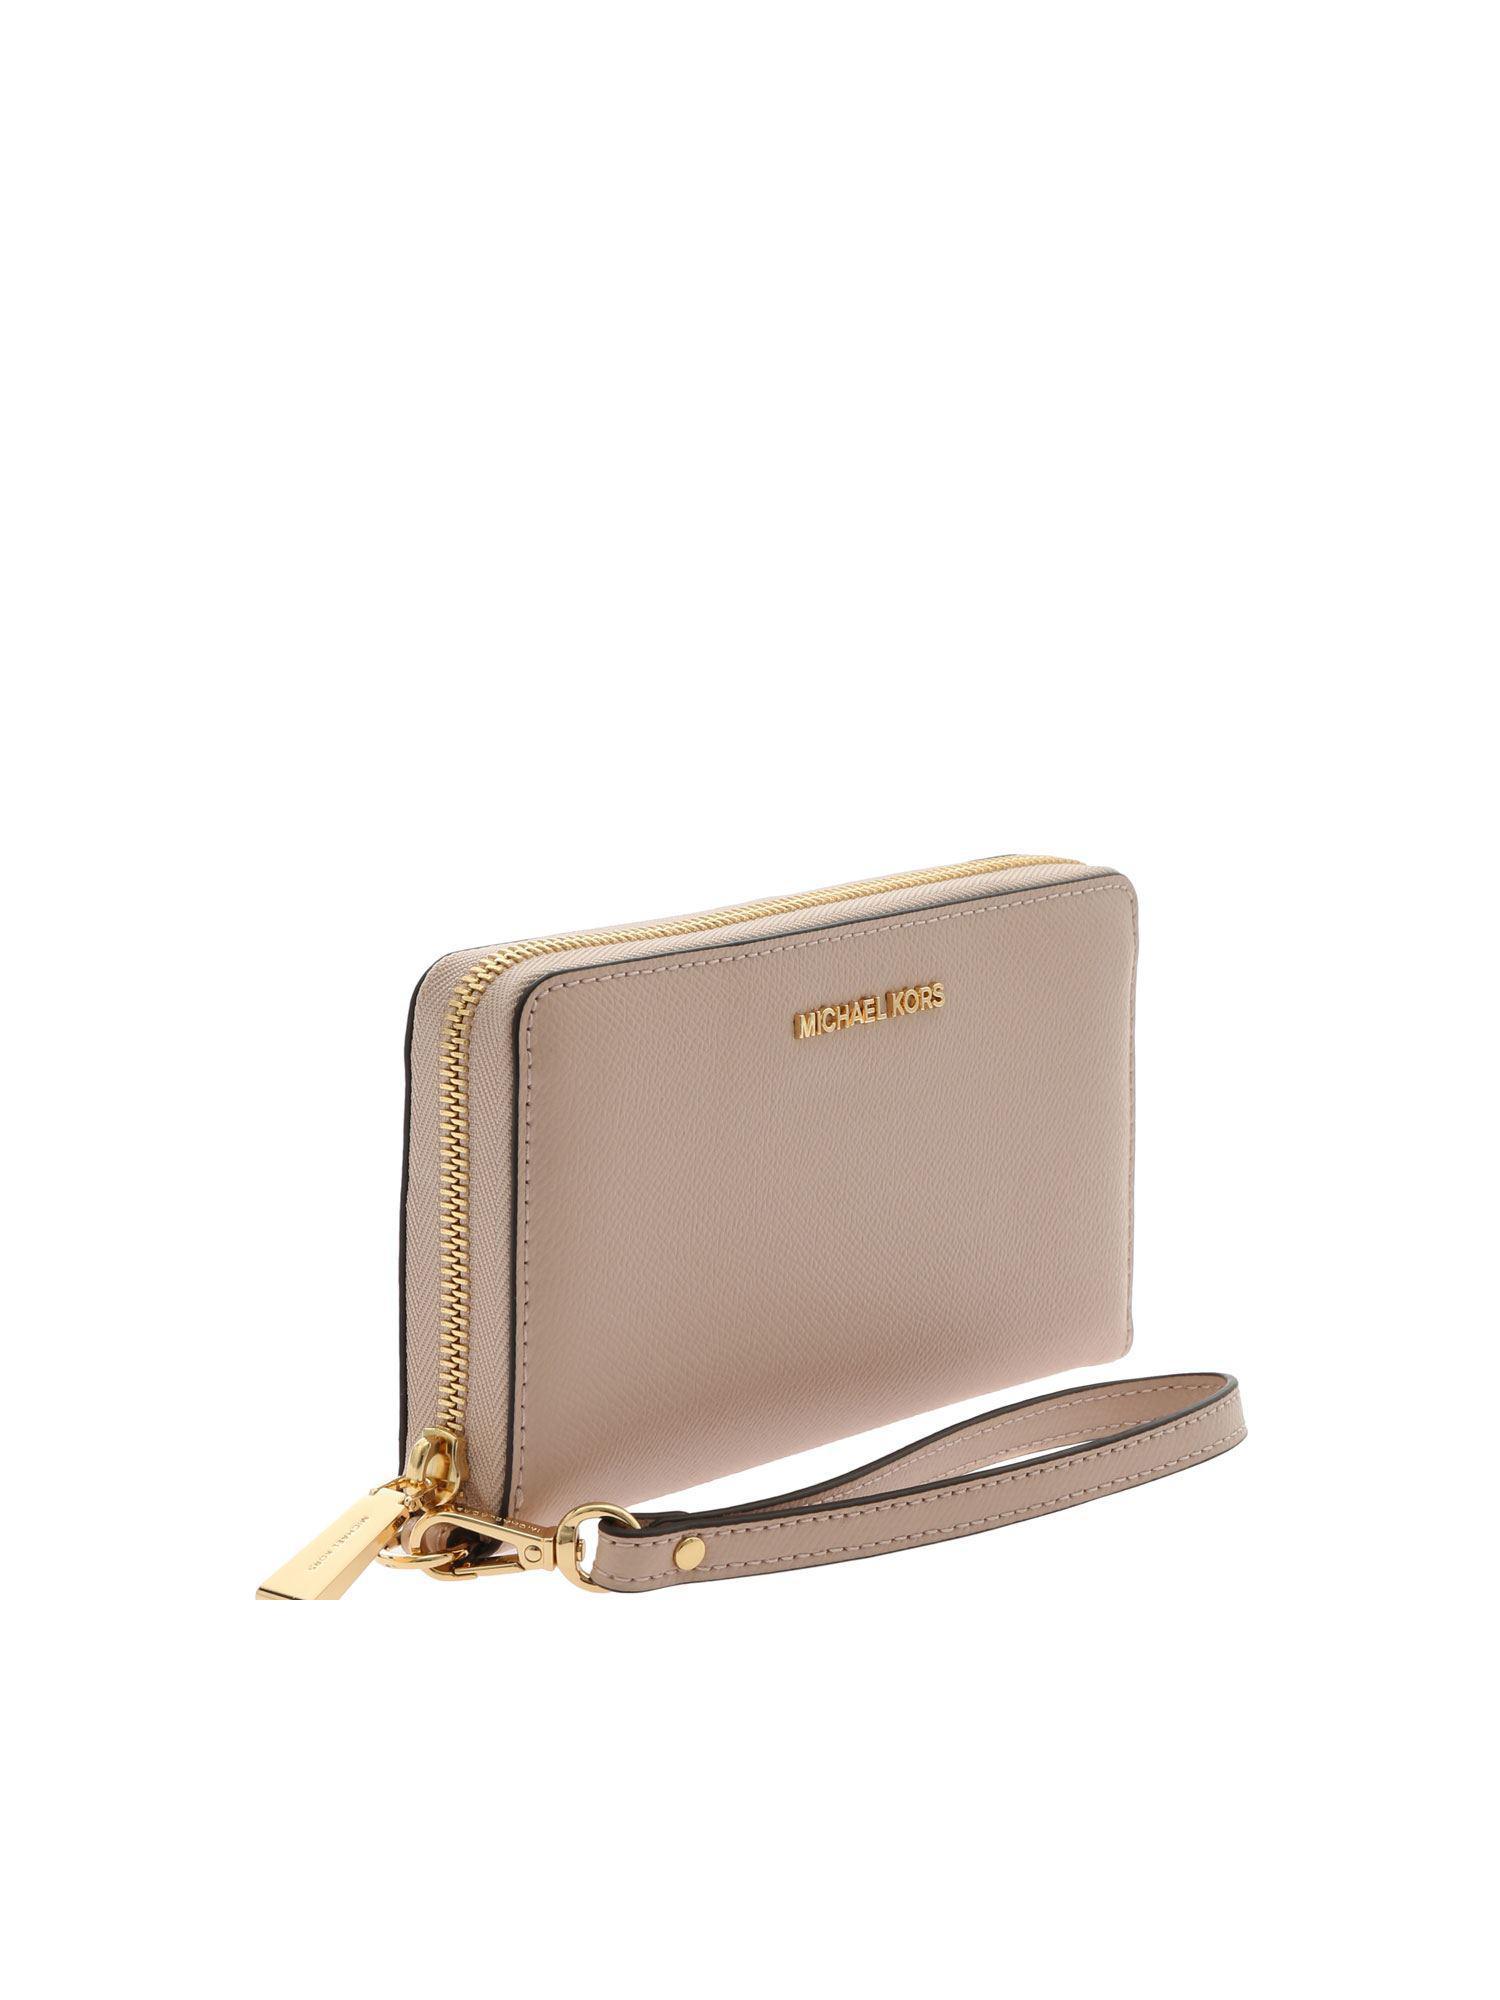 debc1d261548 Michael Kors - Multicolor Jet Set Travel Wallet In Pink Leather - Lyst.  View fullscreen